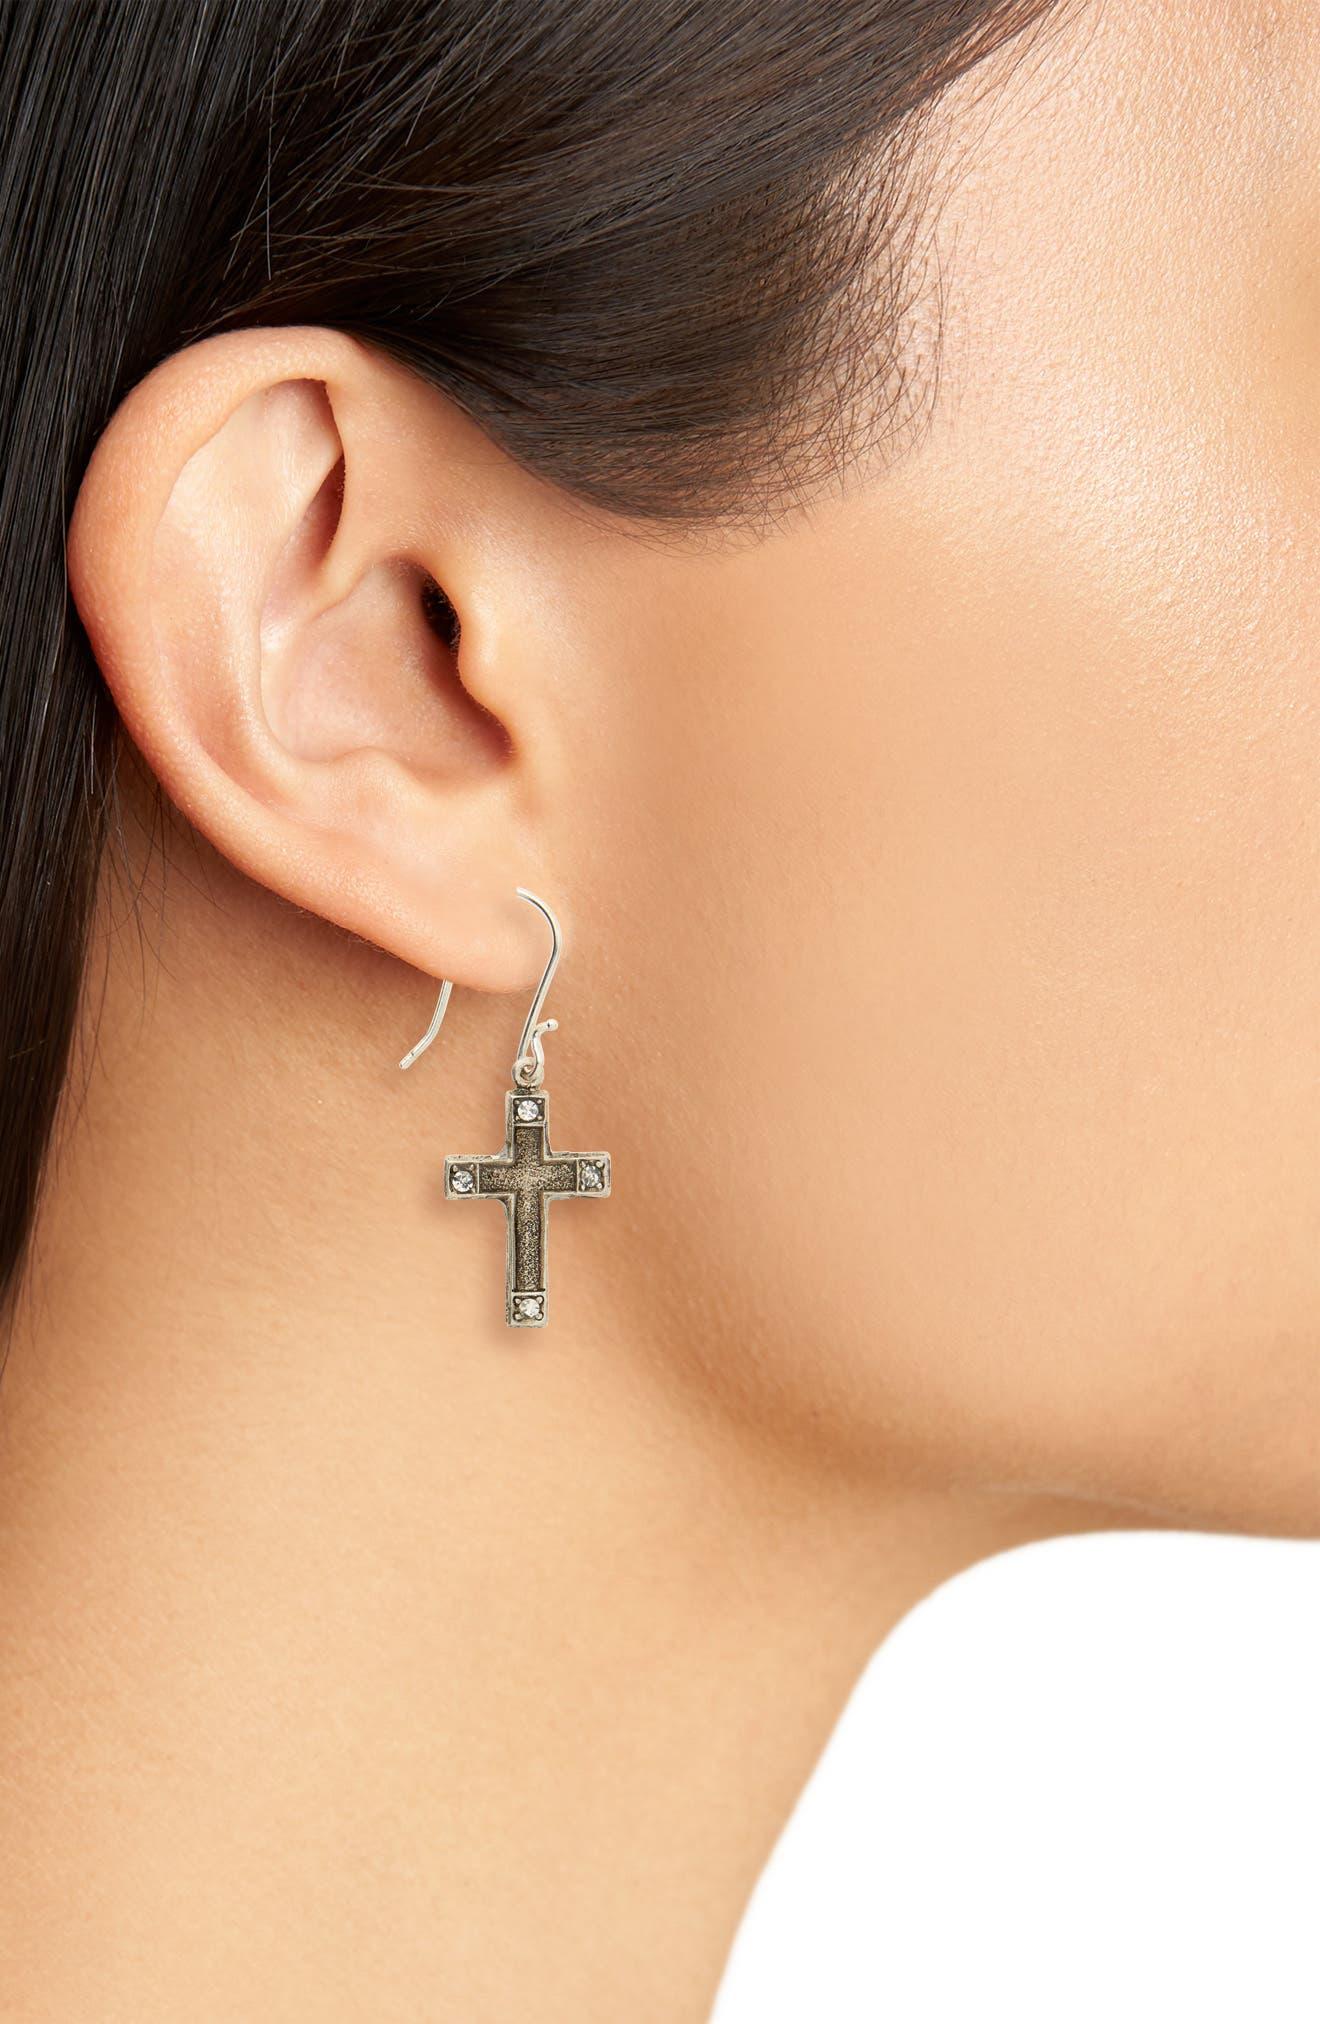 Les Celestes Cross Earrings,                             Alternate thumbnail 2, color,                             Silver